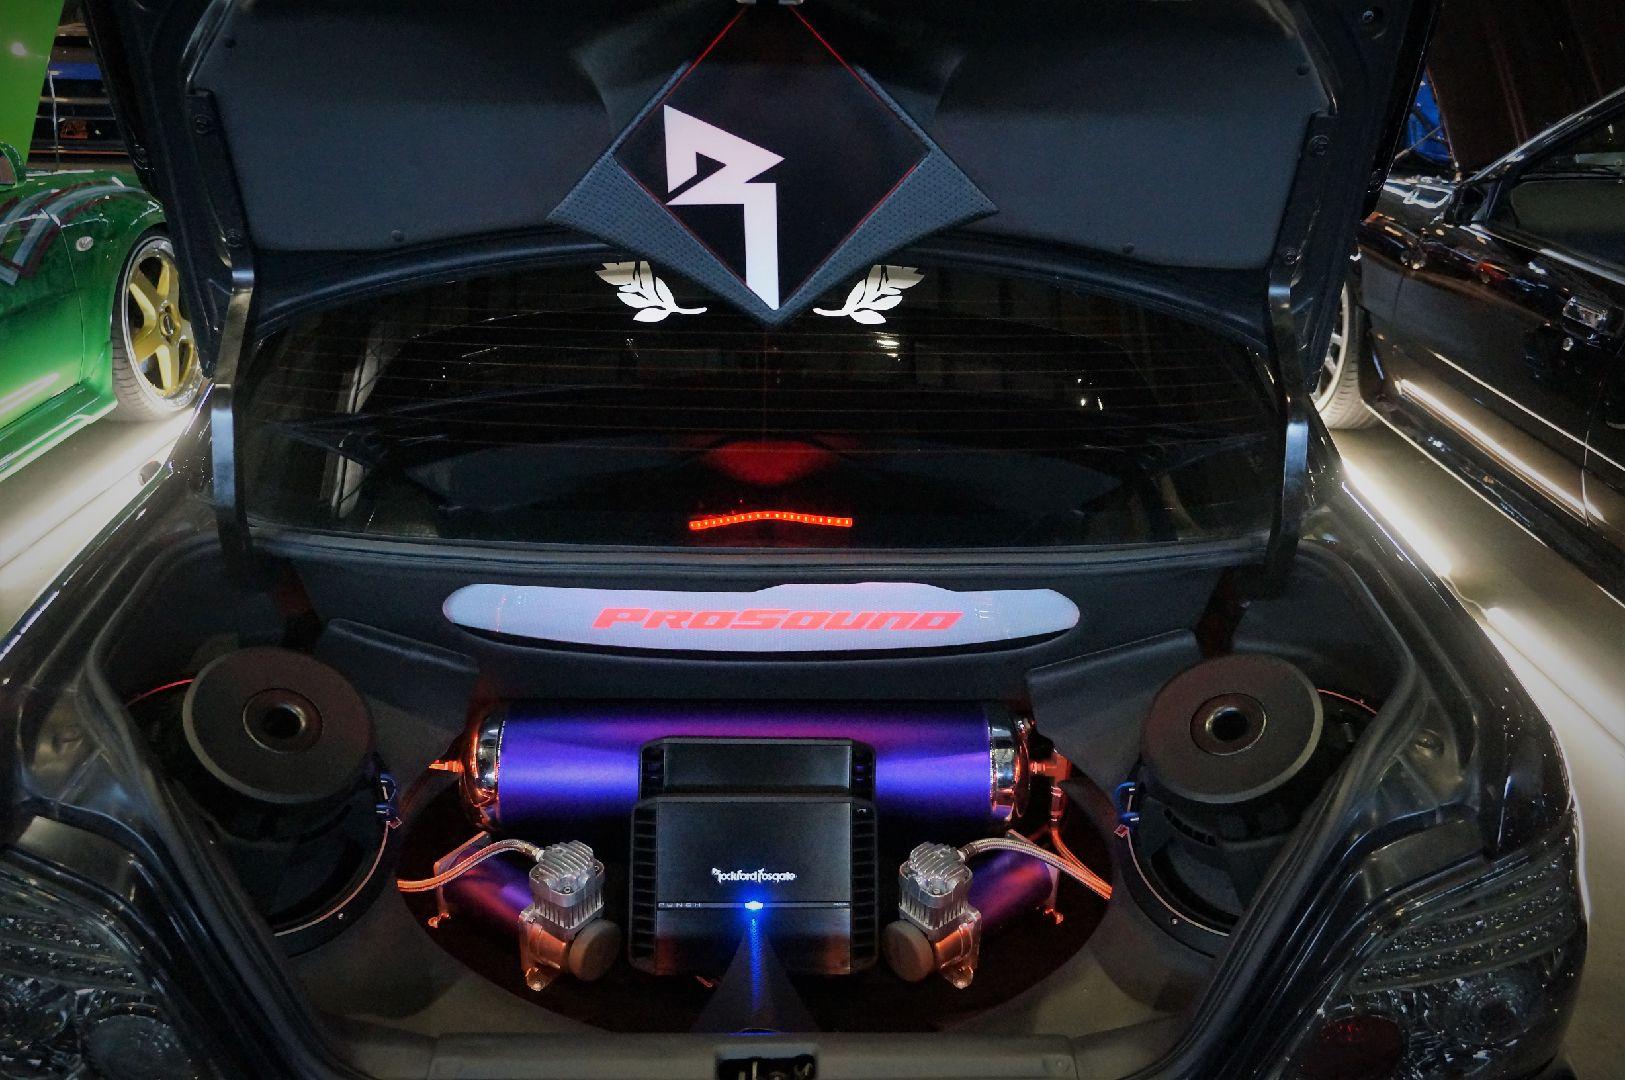 Sponsored Subaru Rockford Custom Installation - https://www.newcastleprosound.com.au/wp-content/uploads/2019/07/Photo-17-12-18-11-25-17-am.jpg